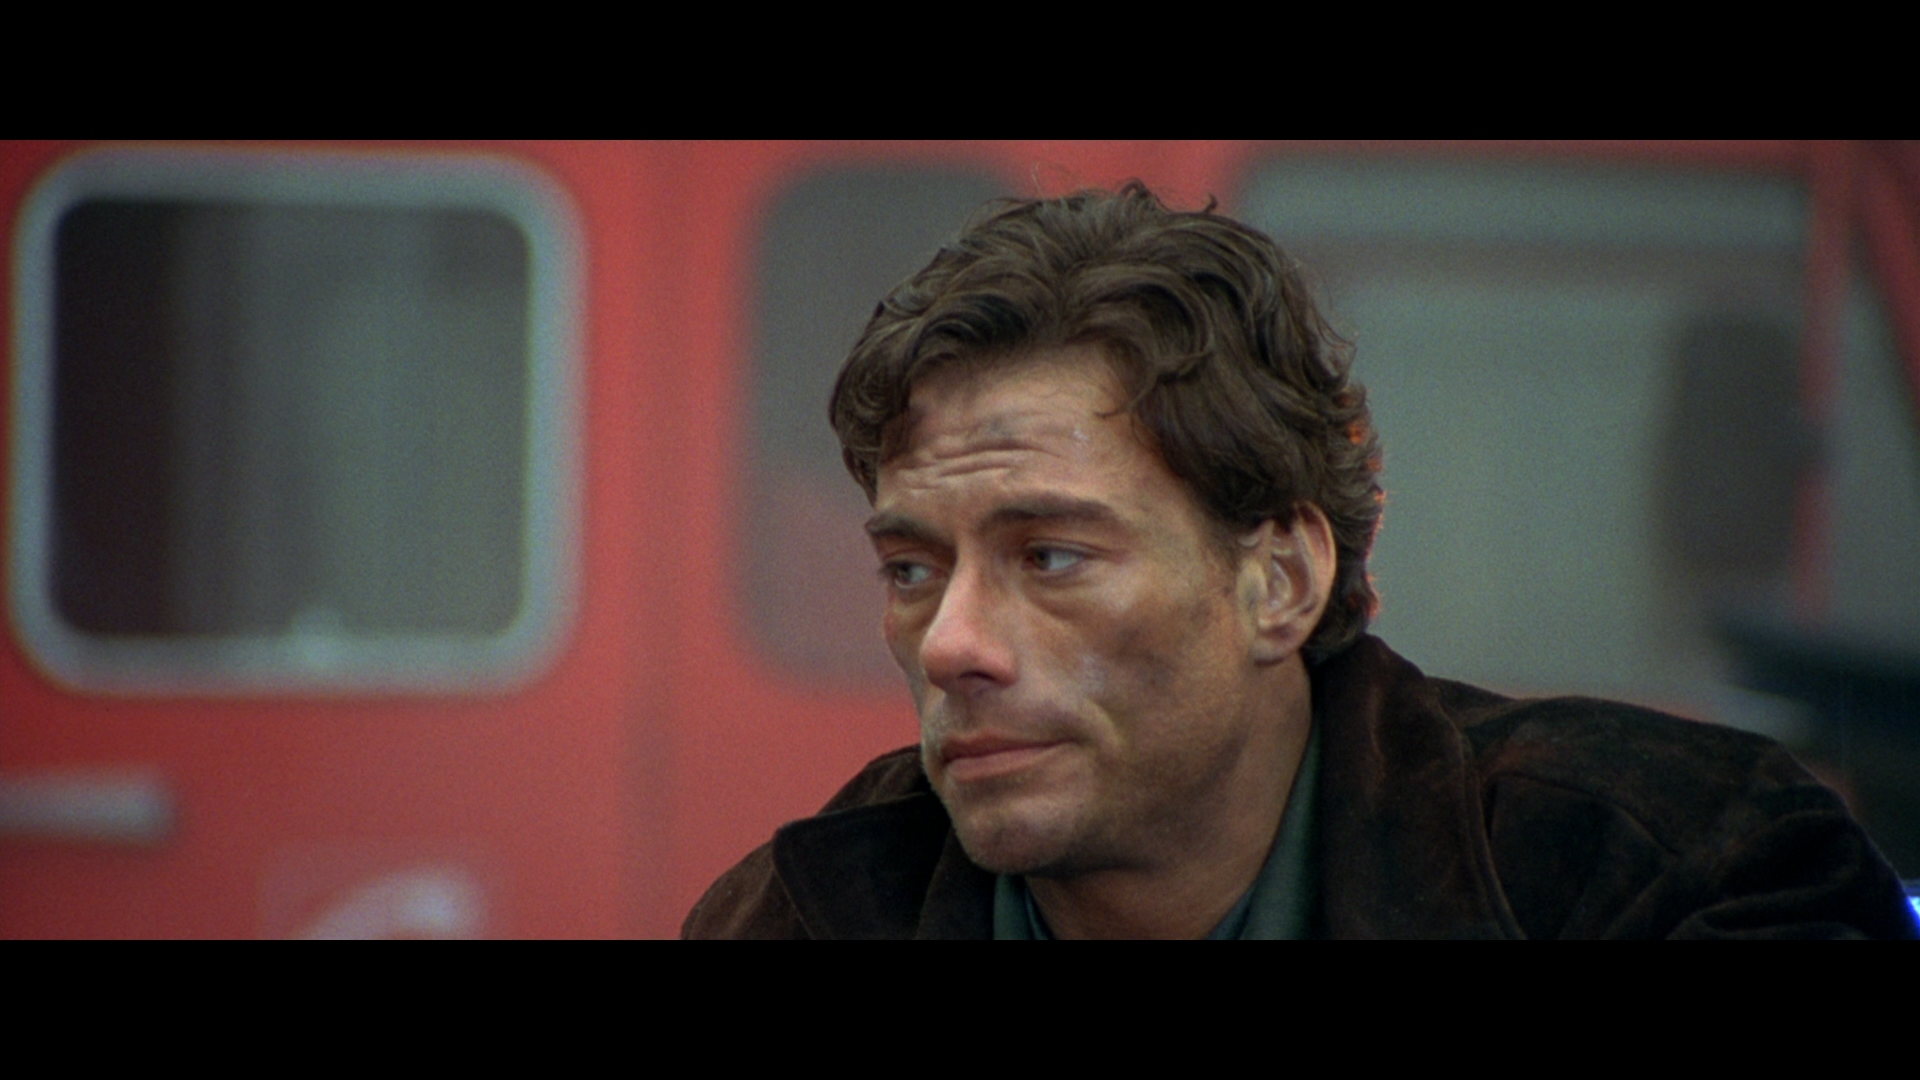 Jean Claude Van Damme   DoBlu com Blu ray reviews HD Wallpaper